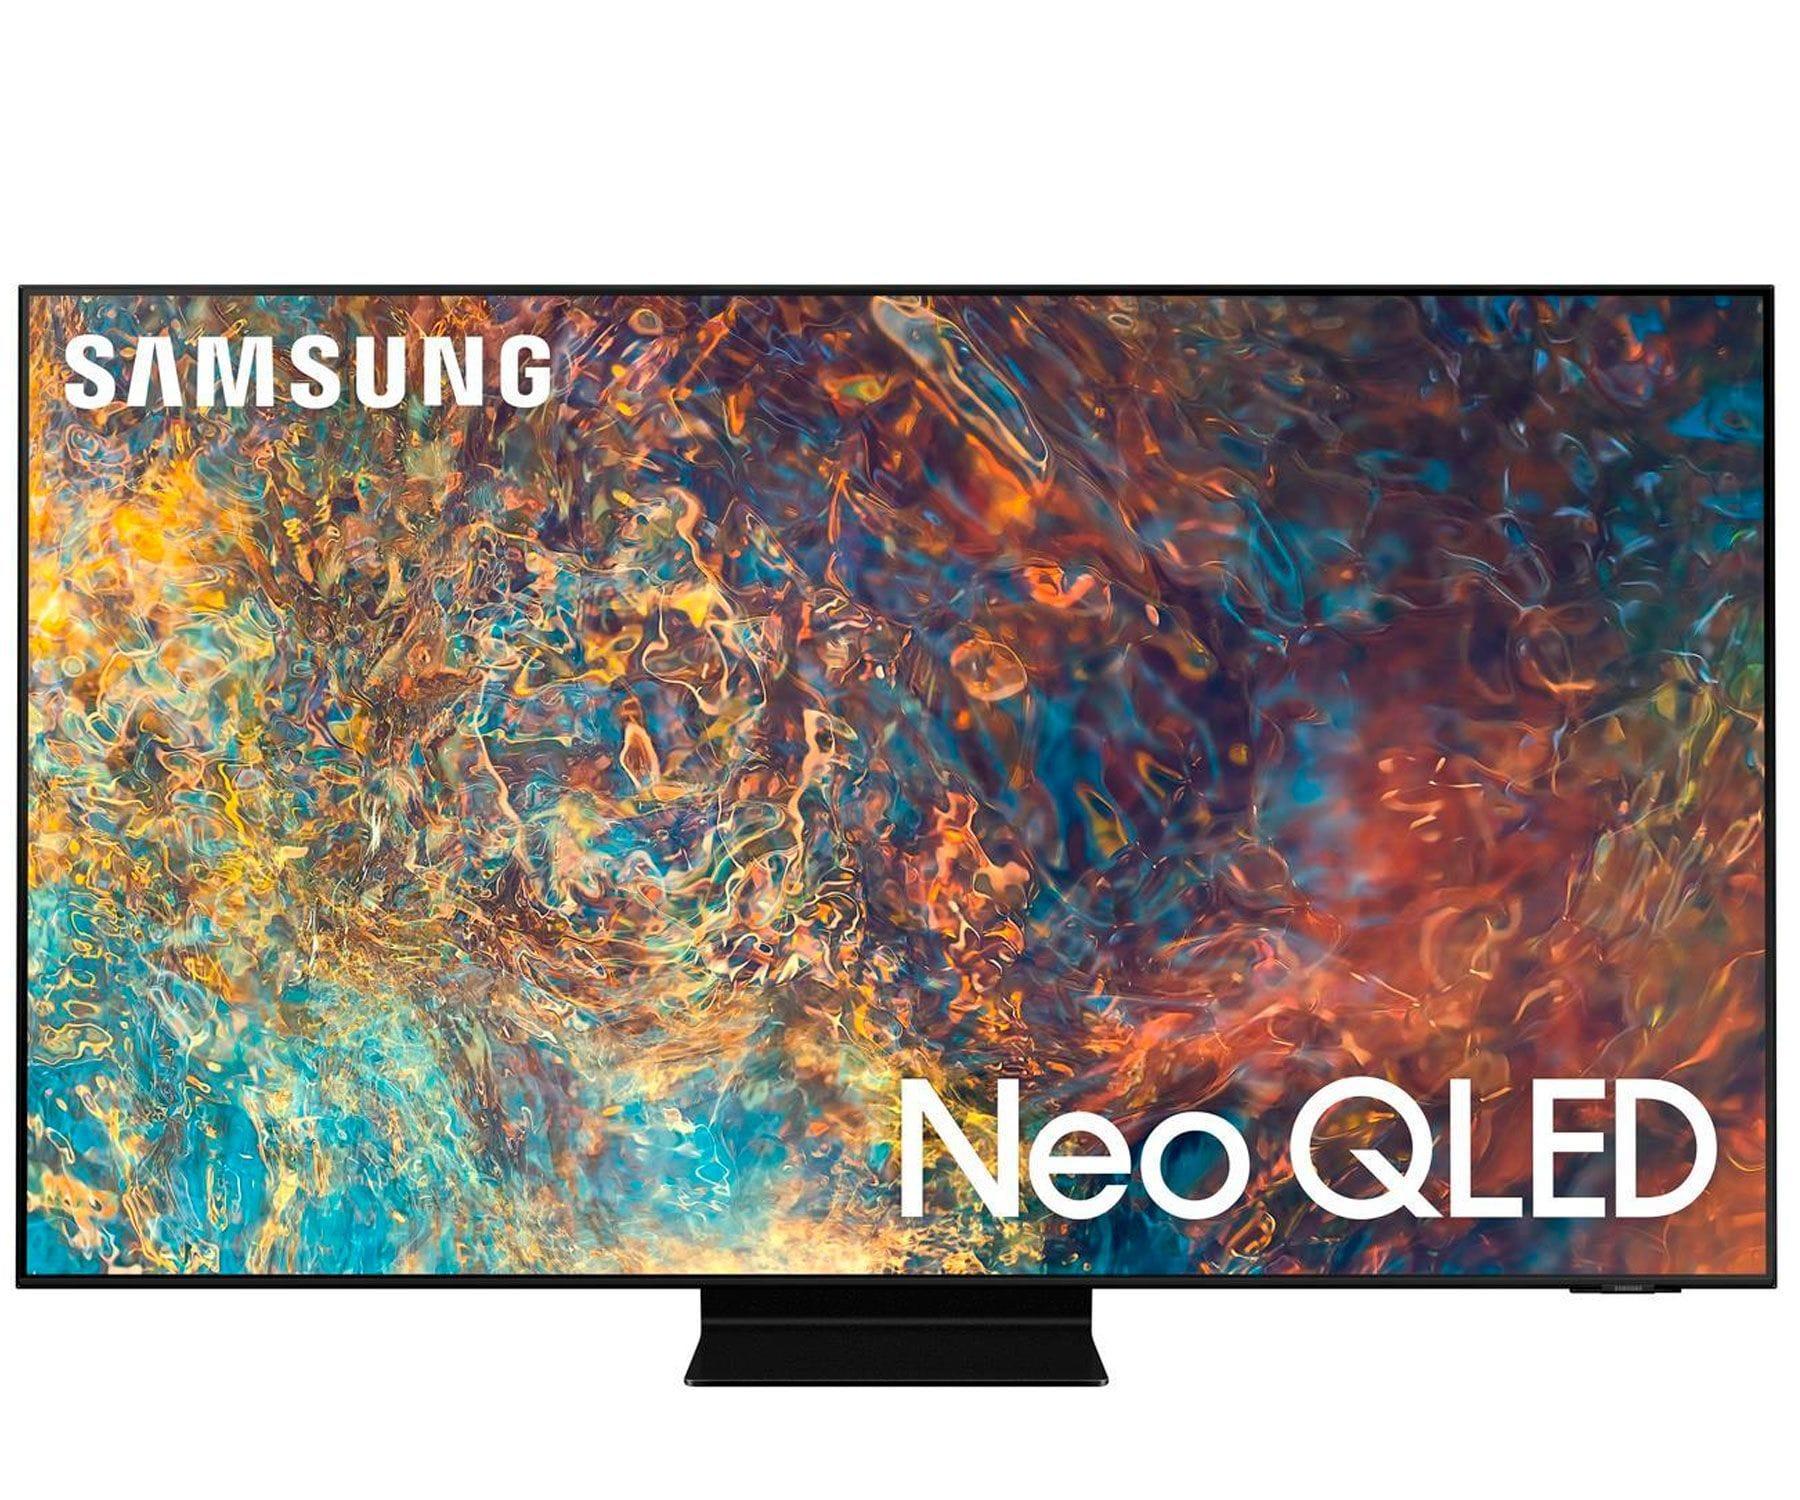 SAMSUNG QE55QN90AATXXC 2020 TELEVISOR 55'' Neo QLED 4K Quantum HDR 2000 SMART TV 4500Hz PQI AMBIENT MODE